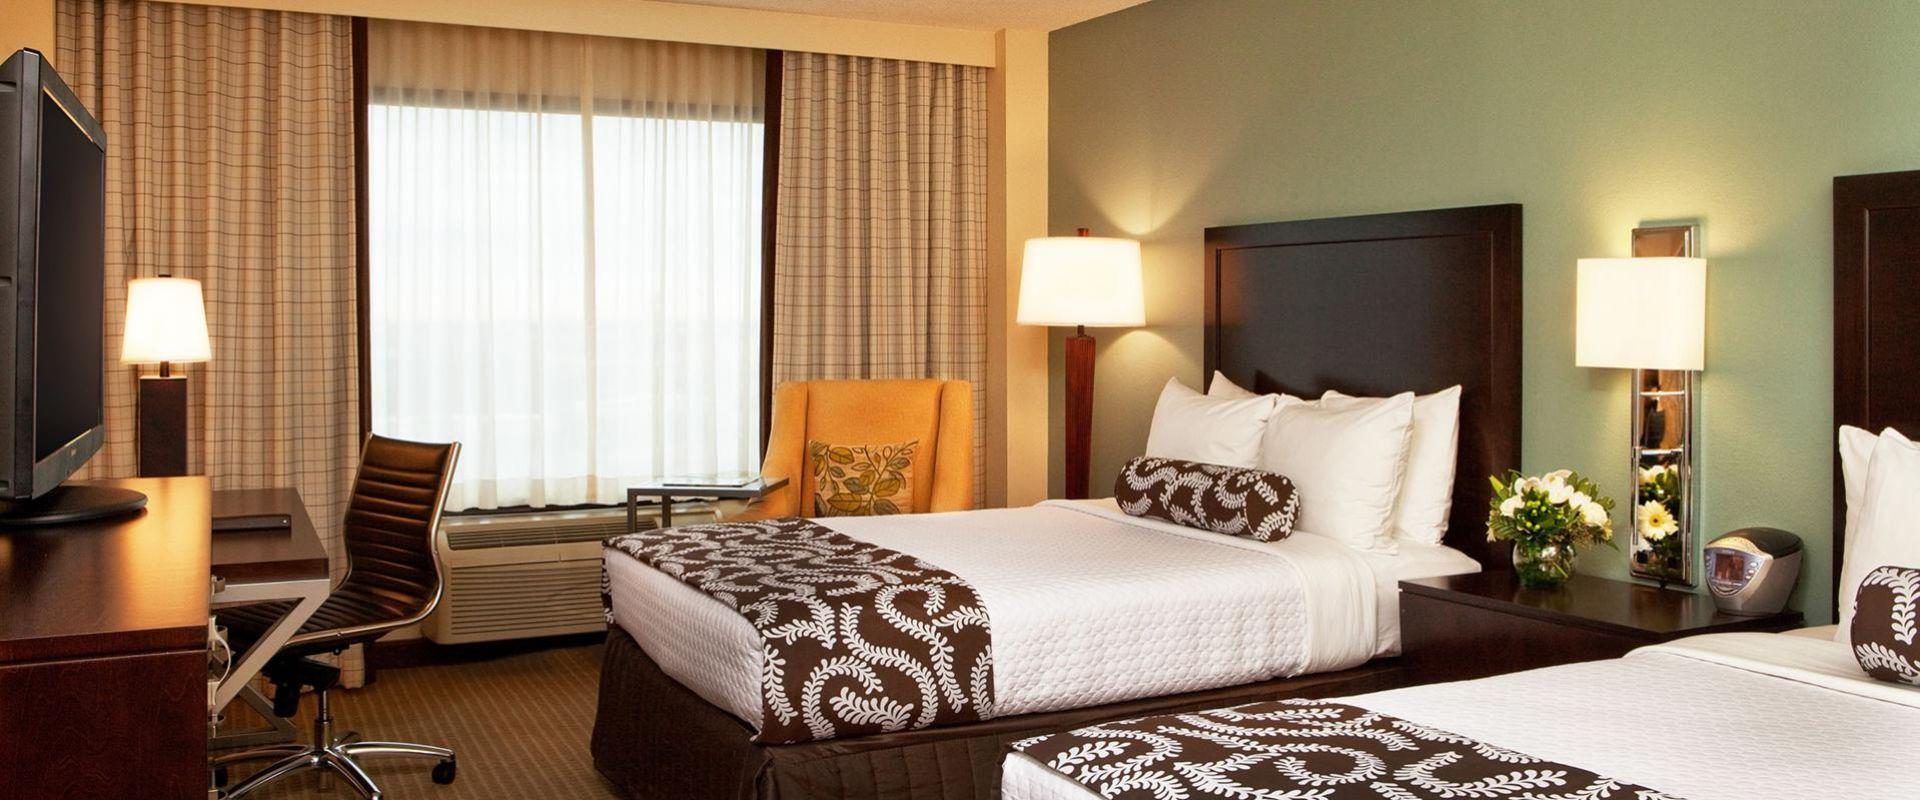 Atlanta Airport Hotel Double Bed Room